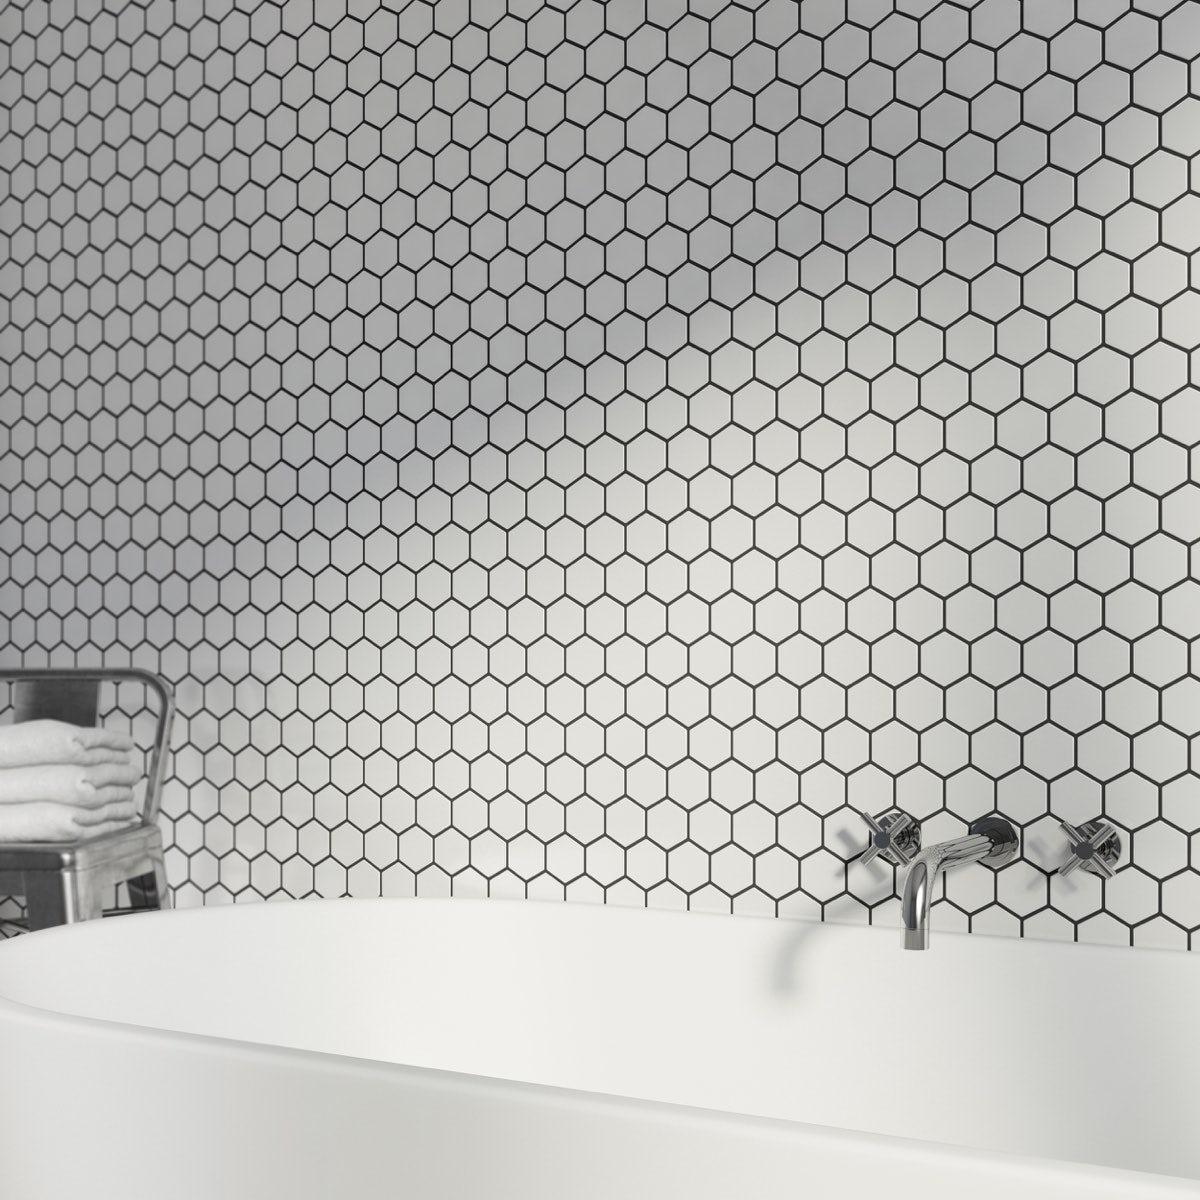 British Ceramic Tile Mosaic Hex White Gloss Tile 300mm X 300mm   1 Sheet Part 70